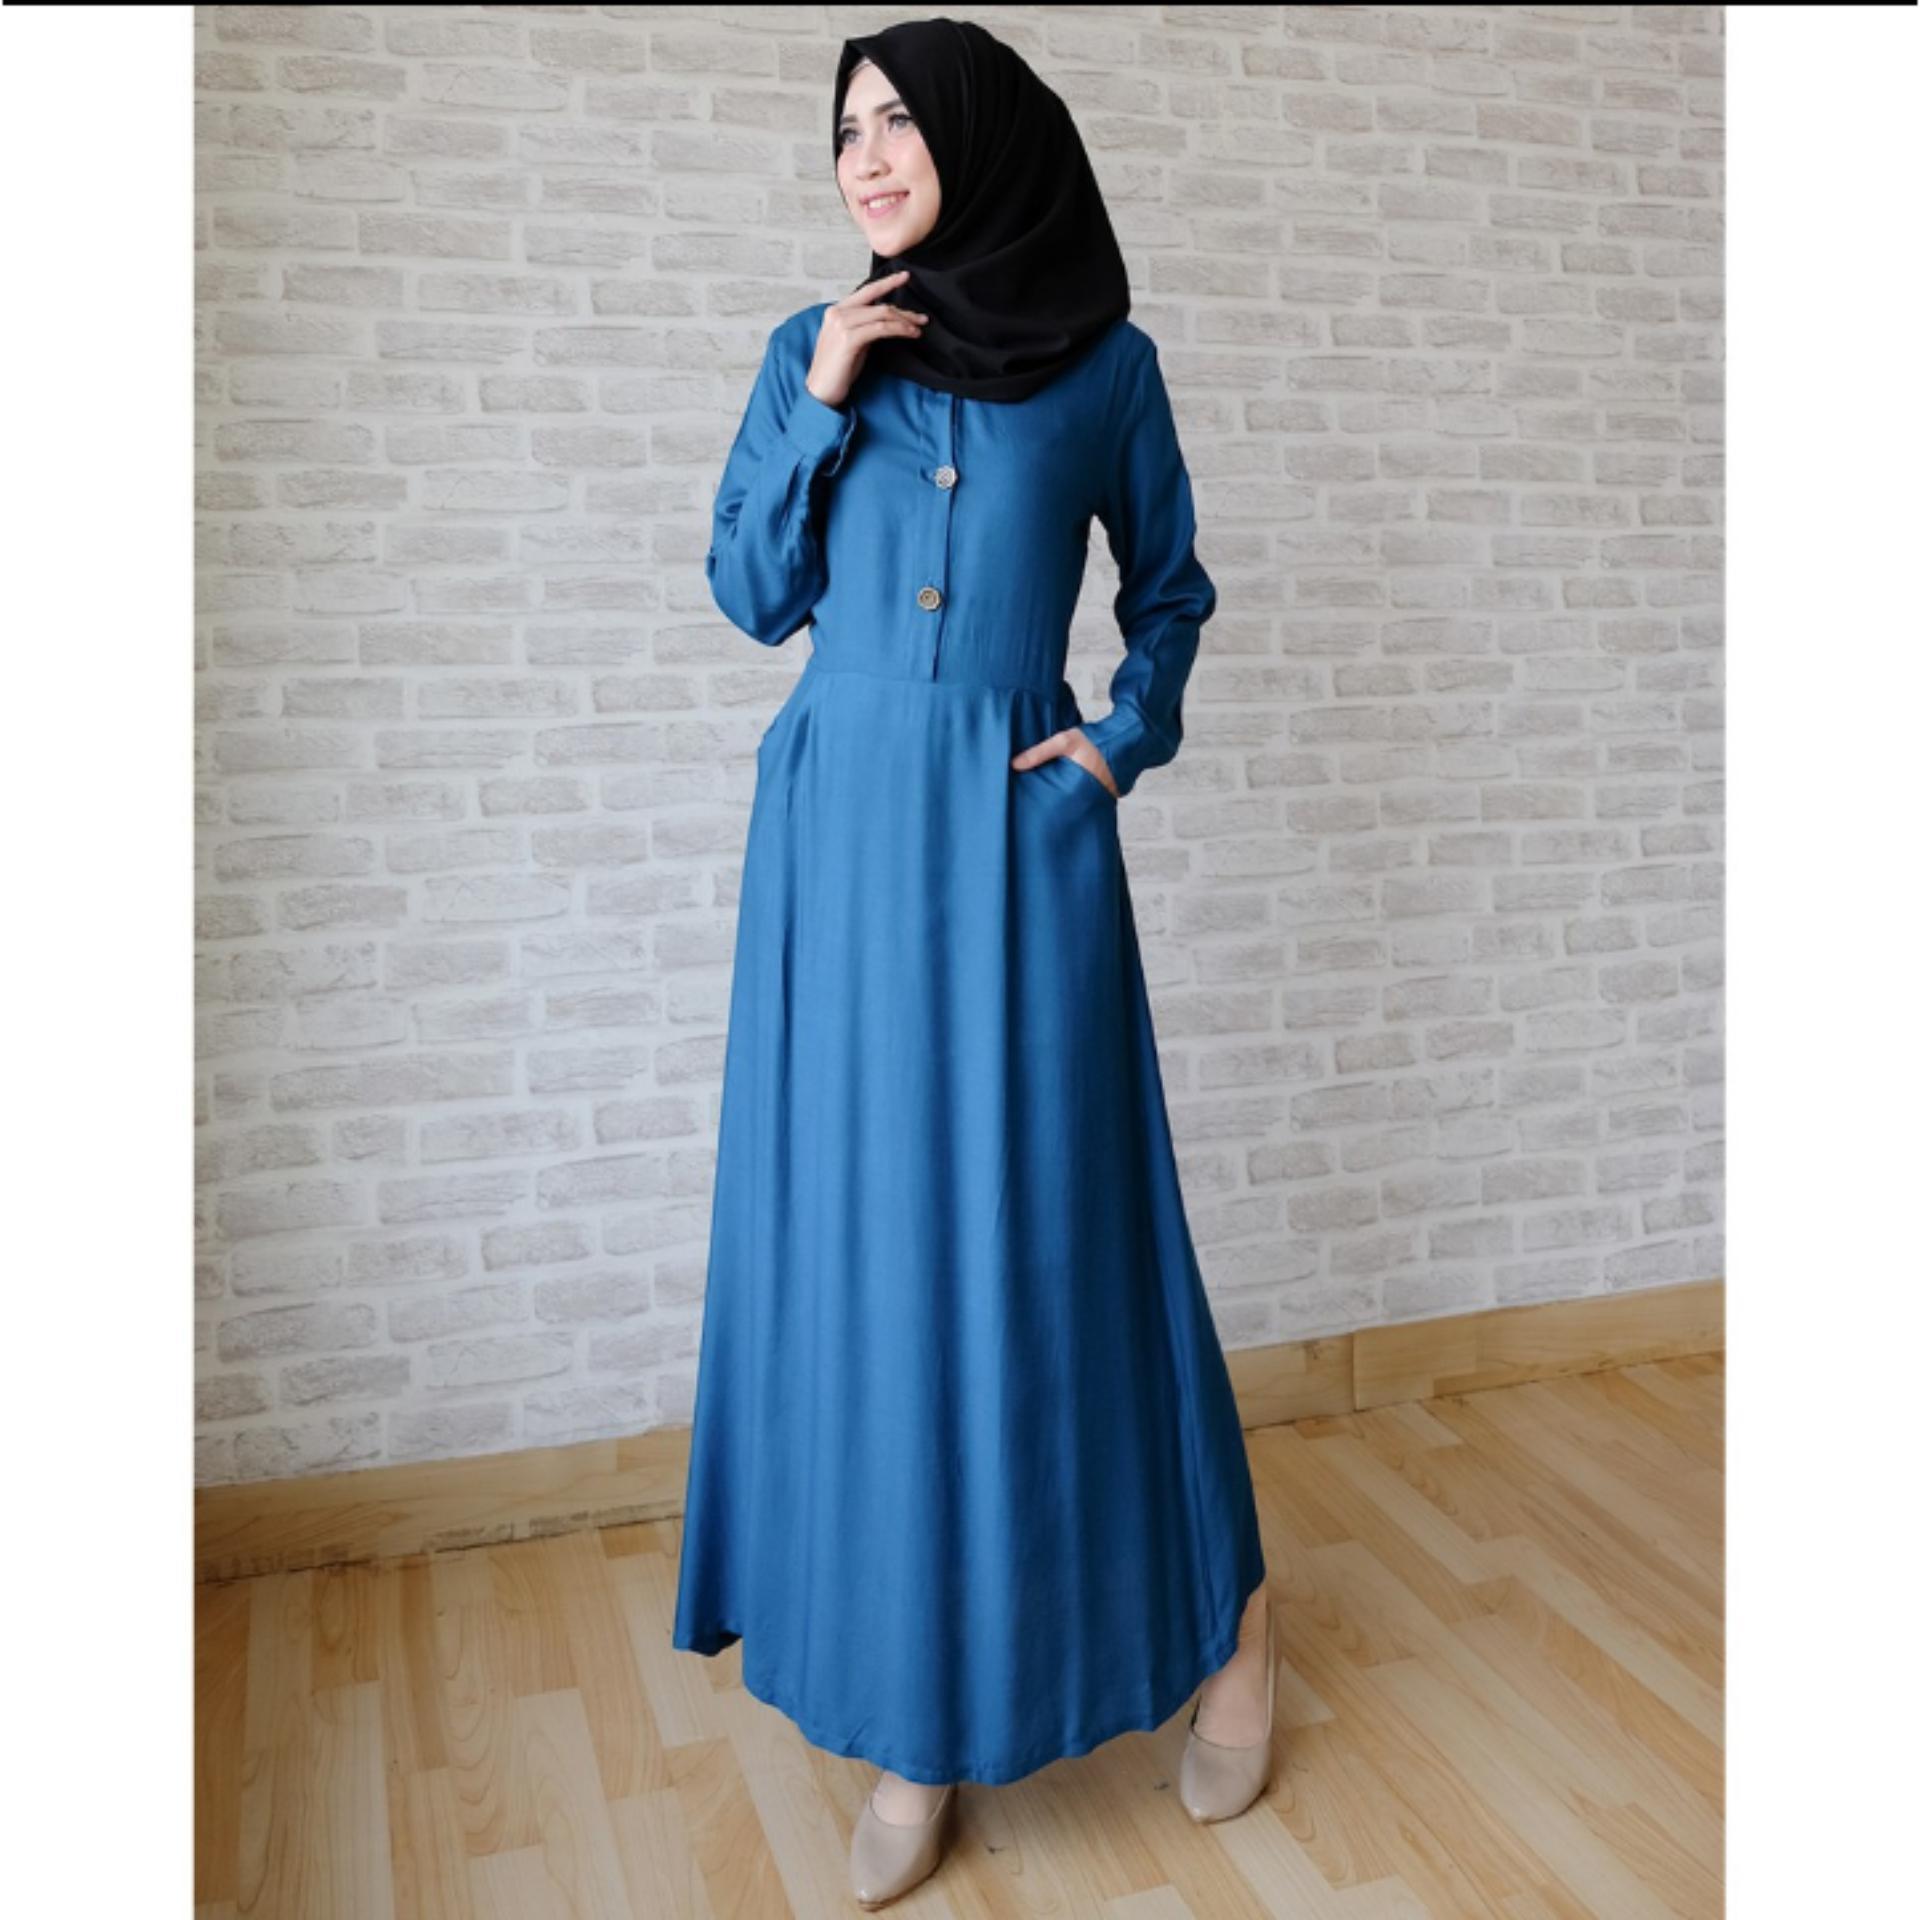 Gemilang Gamis Syari Dress Muslimah With Hijab - All Size